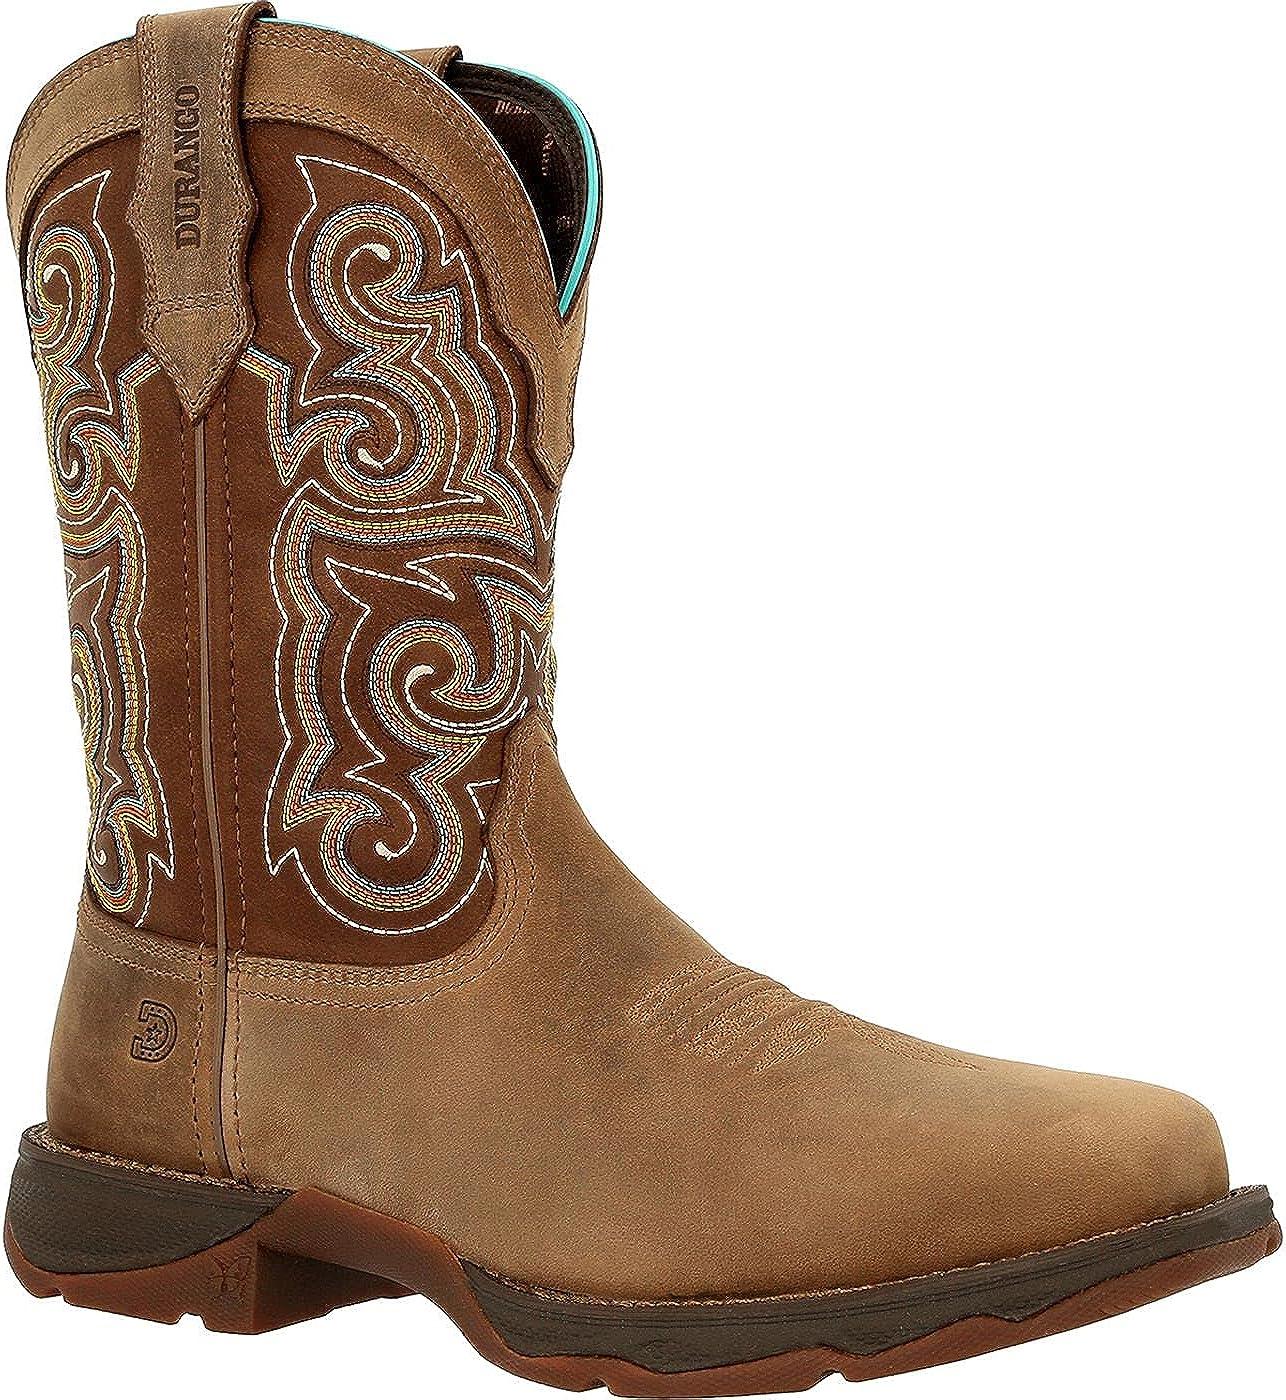 Lady Rebel Work by Durango Composite Toe Western Work Boot